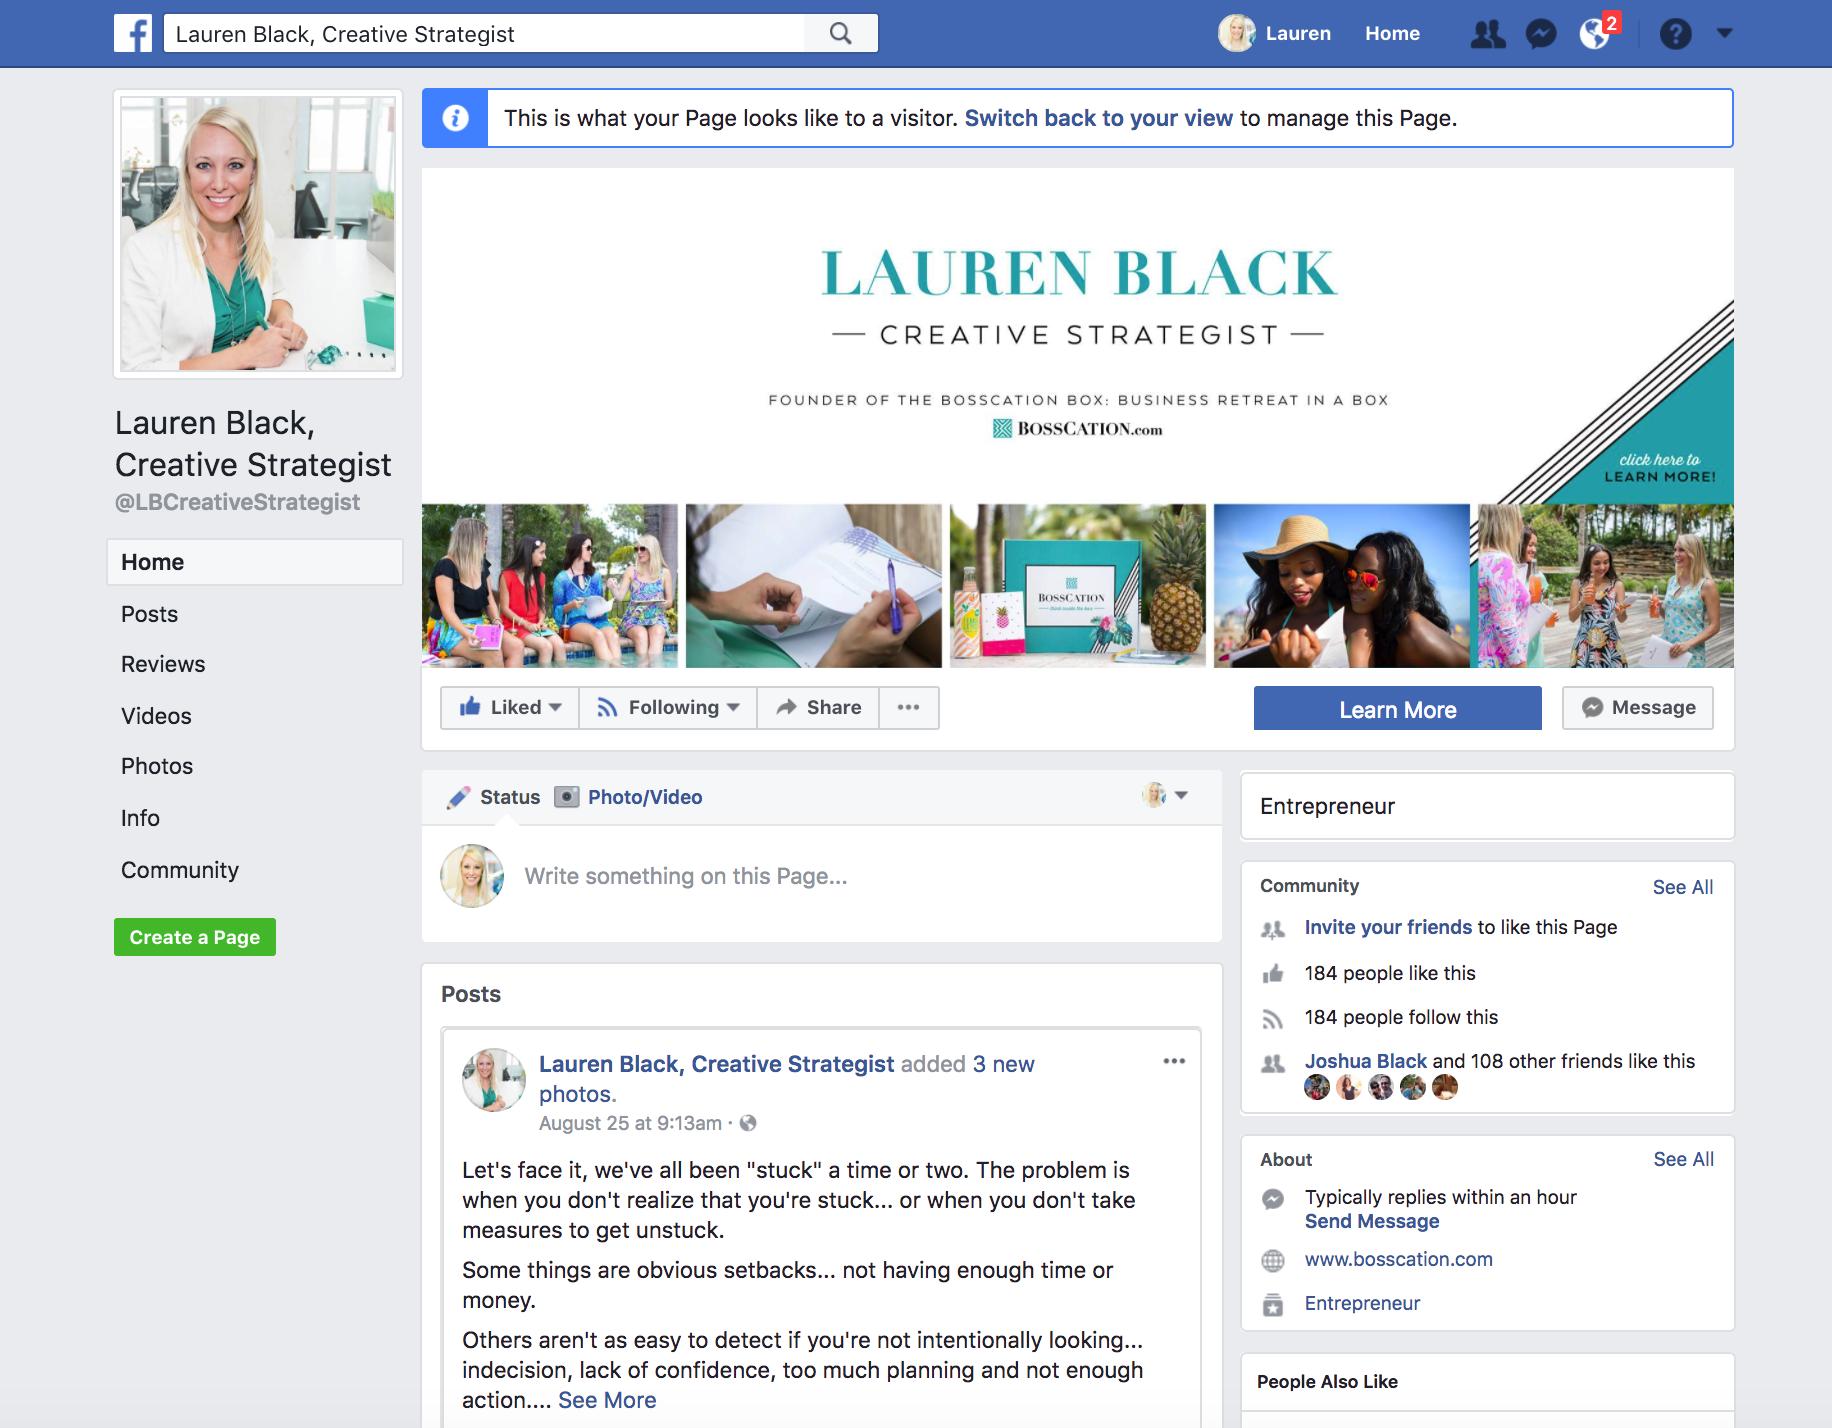 Lauren Black Creative Strategist Facebook